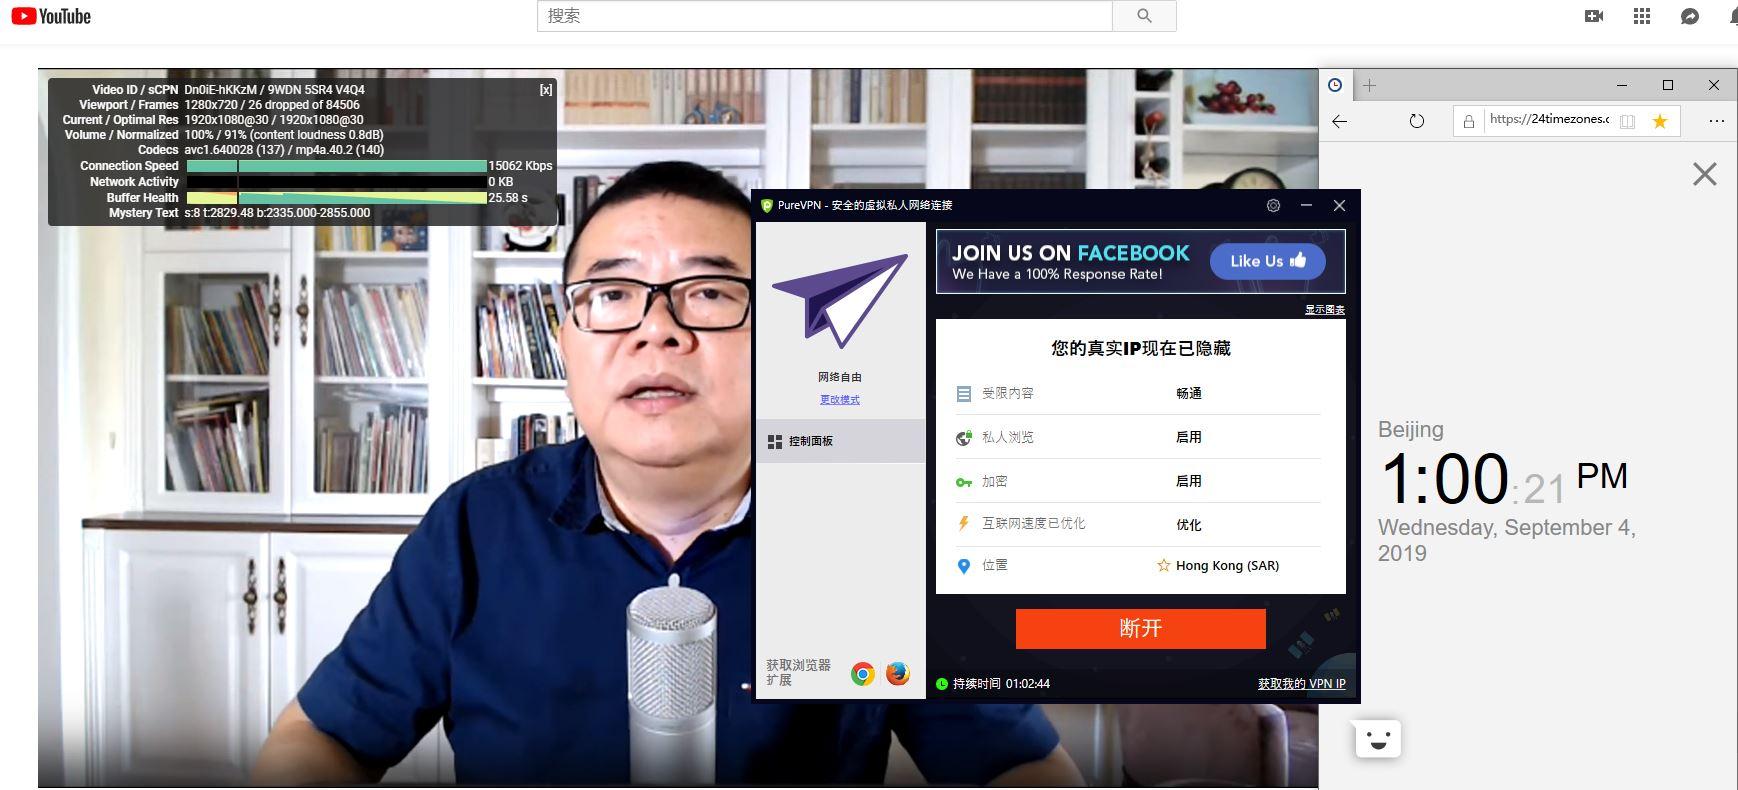 windows Purevpn HongKong 中国翻墙 科学上网 YouTube测试-20190904